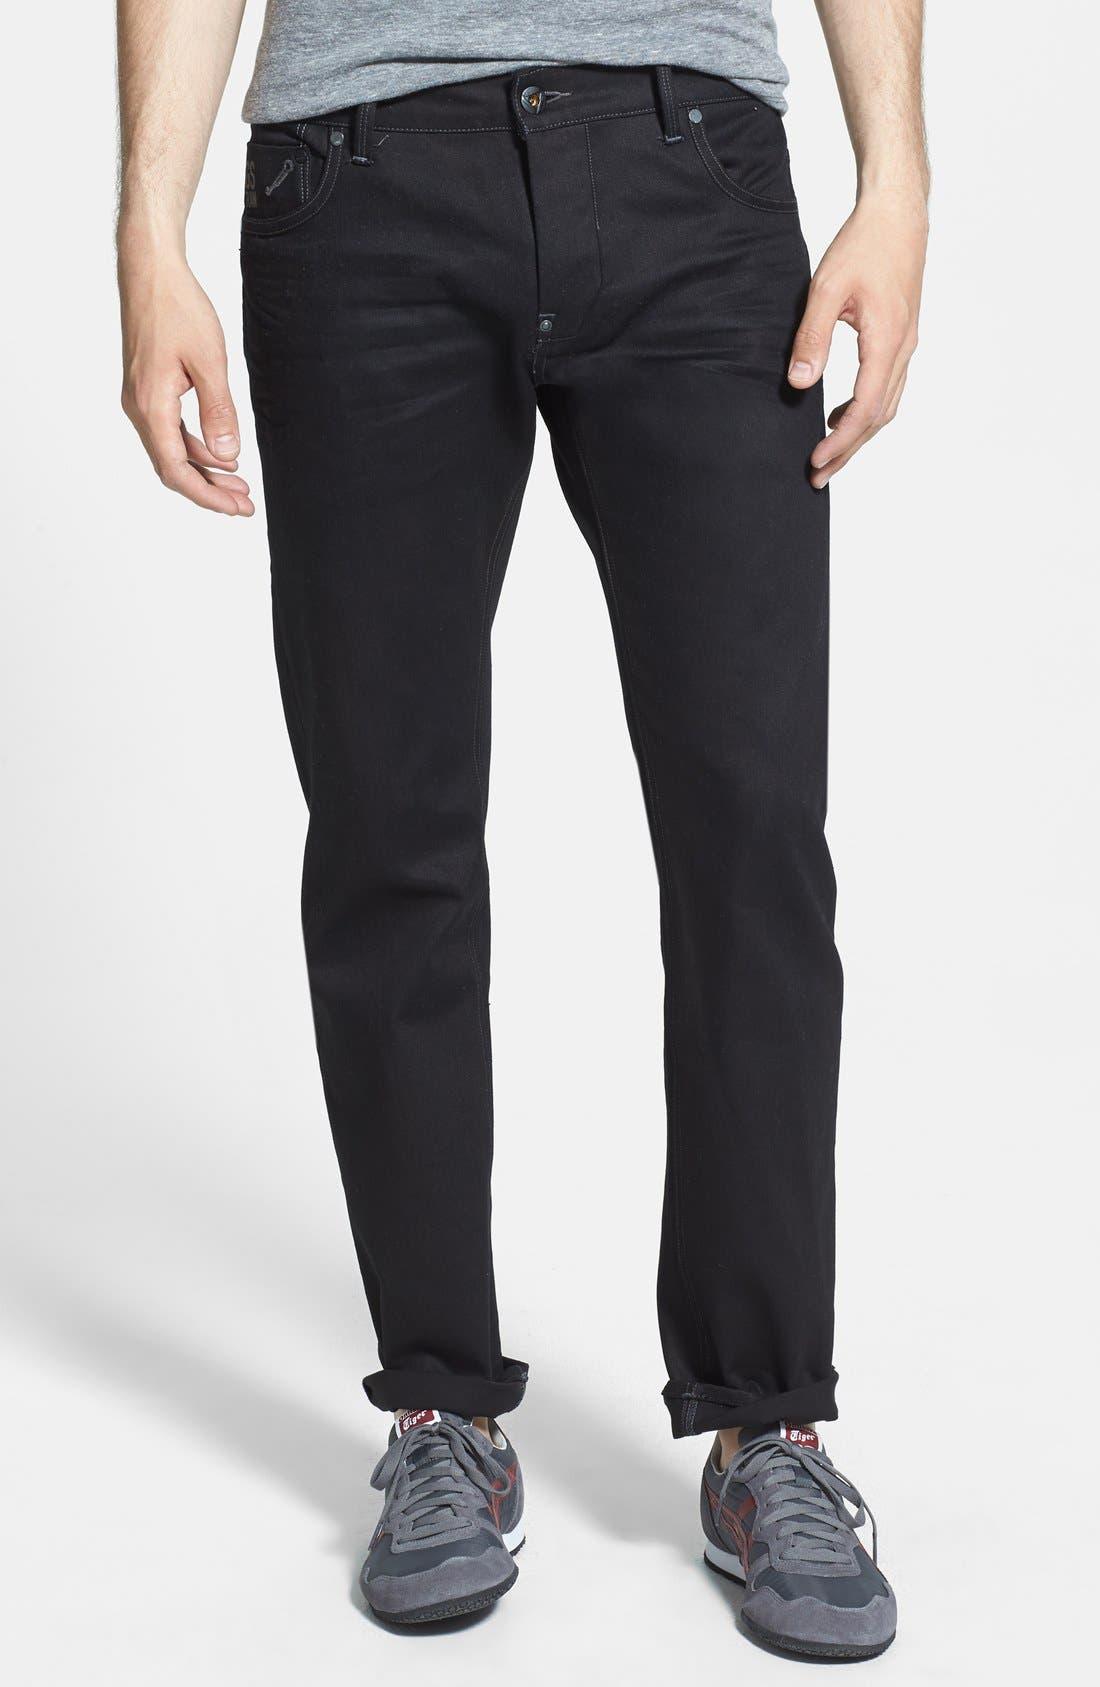 Main Image - G-Star Raw 'Defend Edington' Slouchy Slim Fit Jeans (3D Raw)